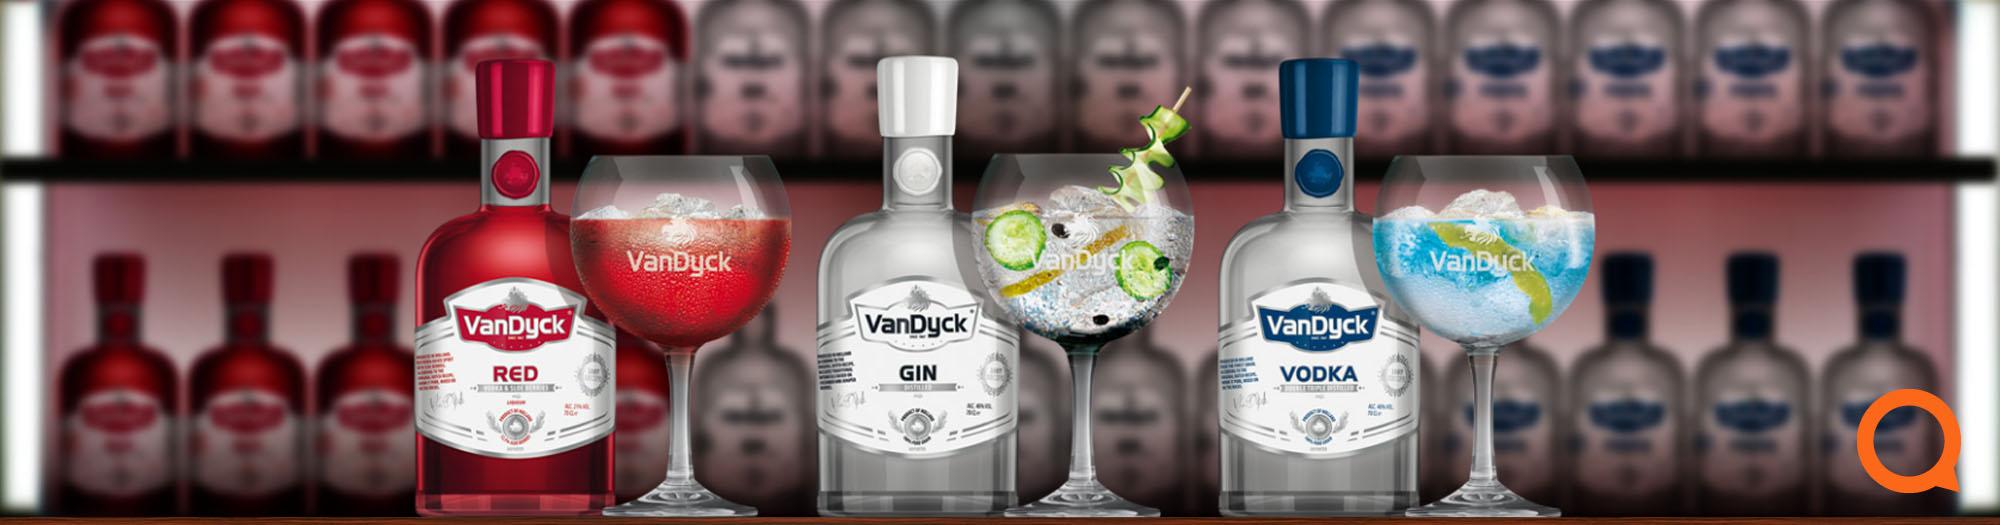 VanDyck Spirits